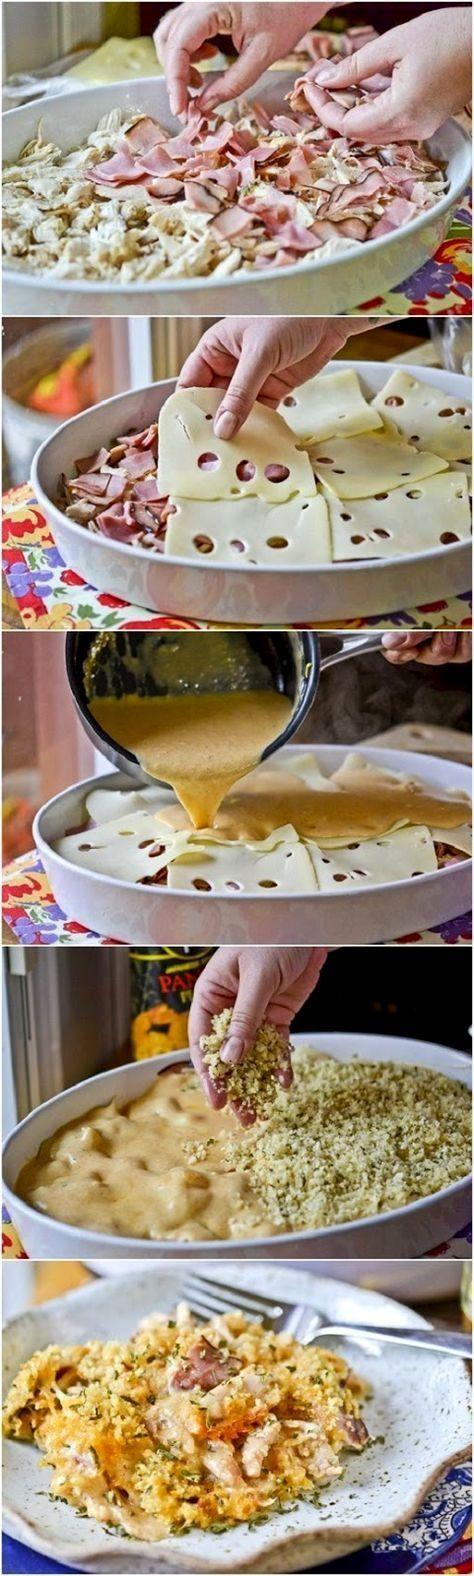 Low-Carb Chicken Cordon Bleu Casserole Recipe******GOOD !**********